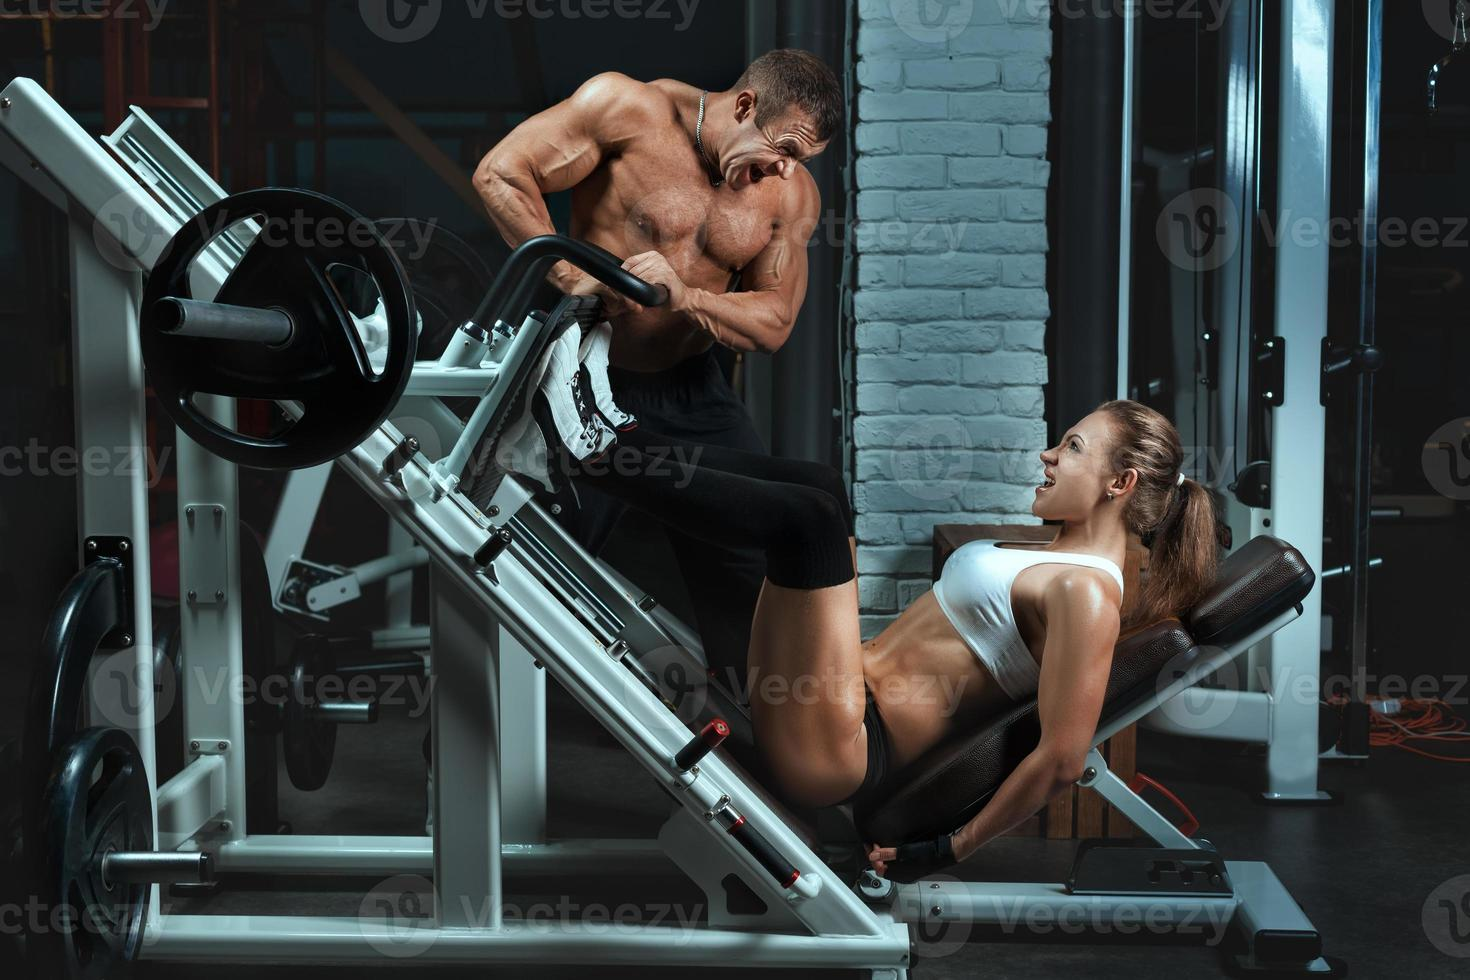 Man bodybuilder trains the a woman. photo